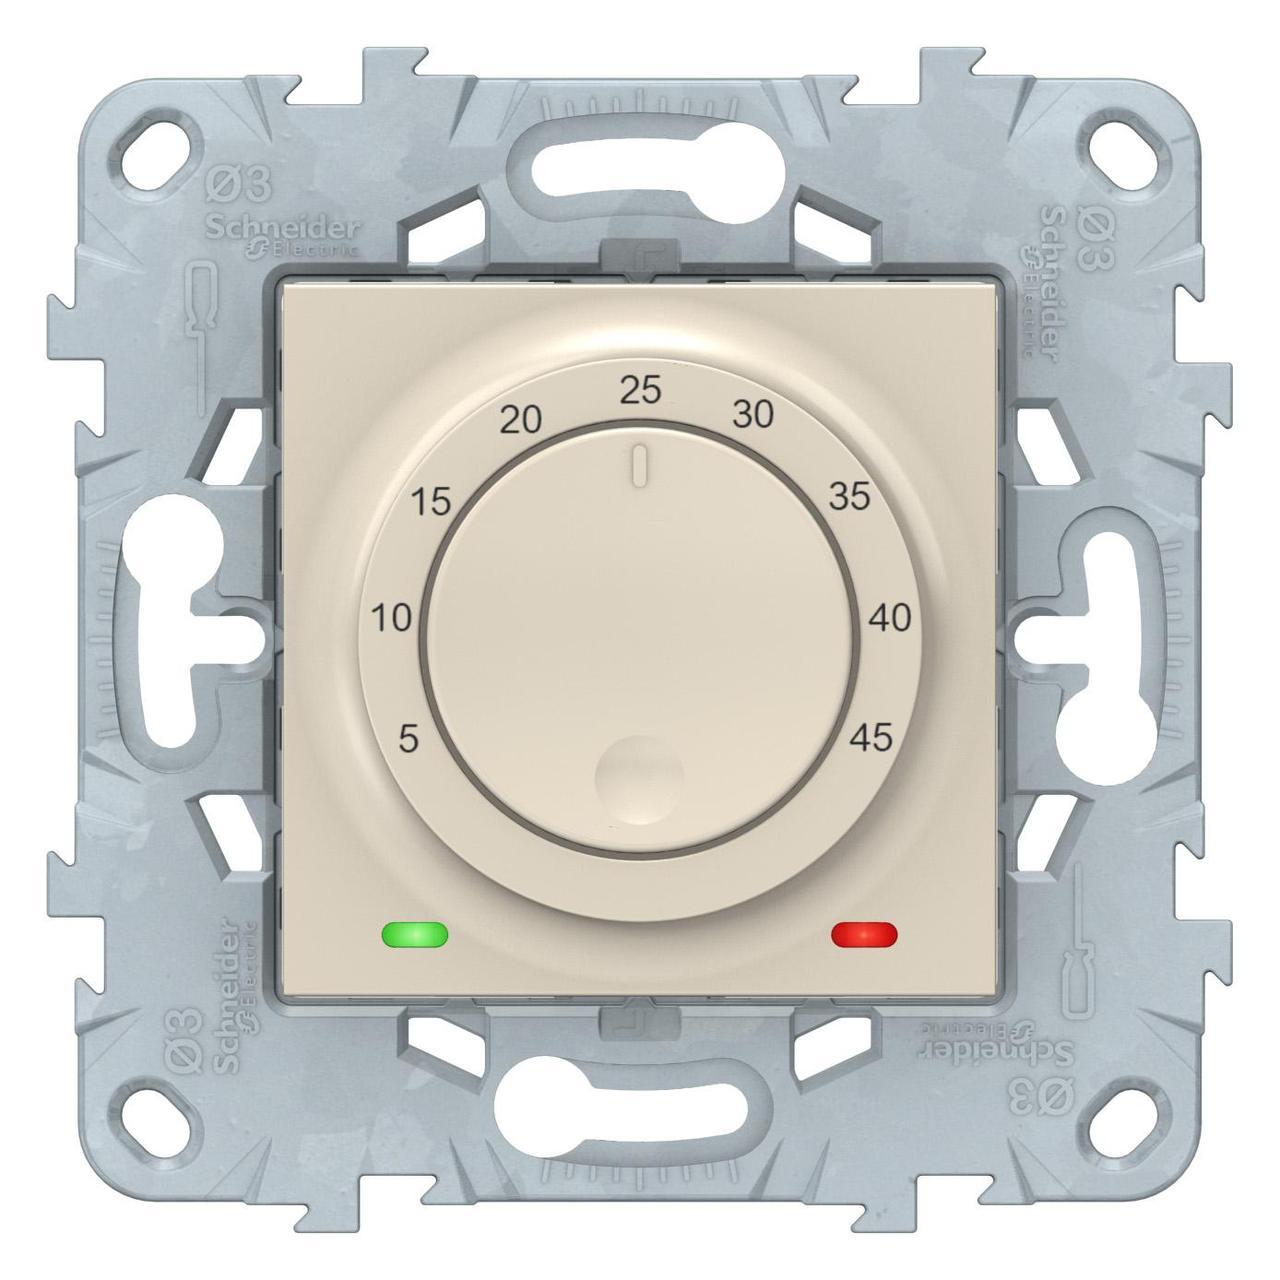 Терморегулятор для теплого пола , Бежевый, серия Unica New, Schneider Electric